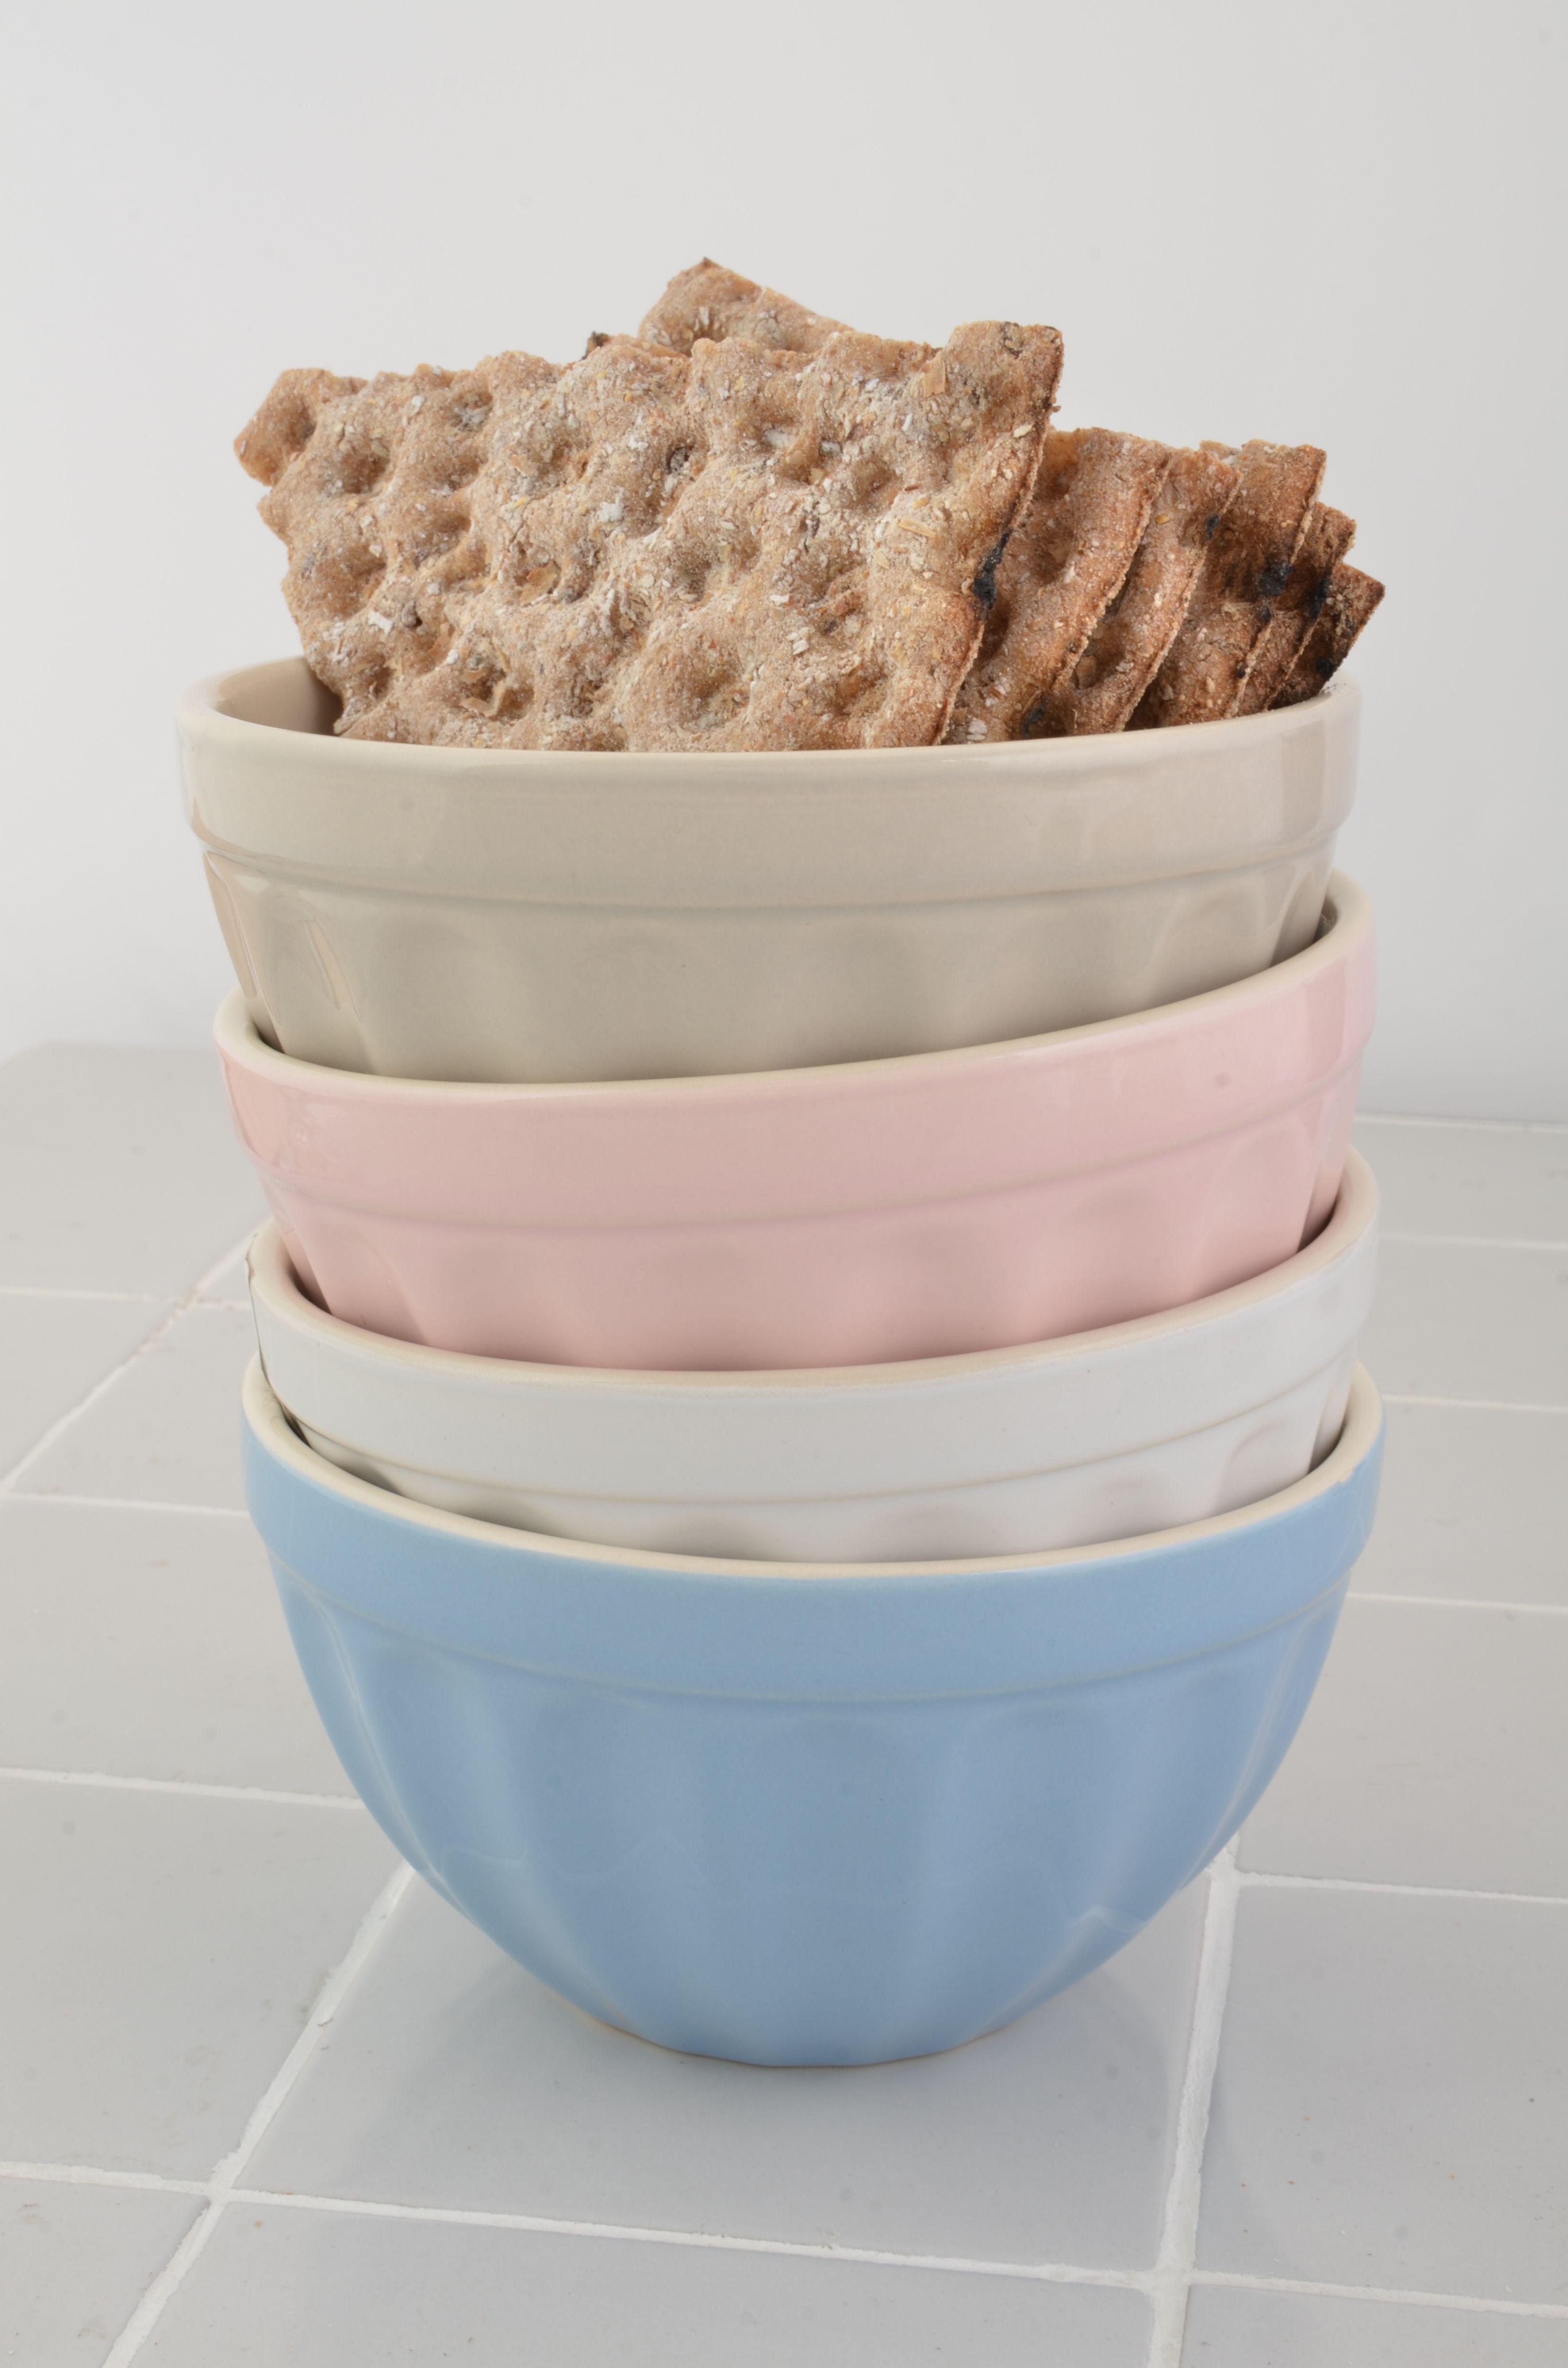 Mynte stoneware by Ib Laursen müsli bowls in Cafe Latte English